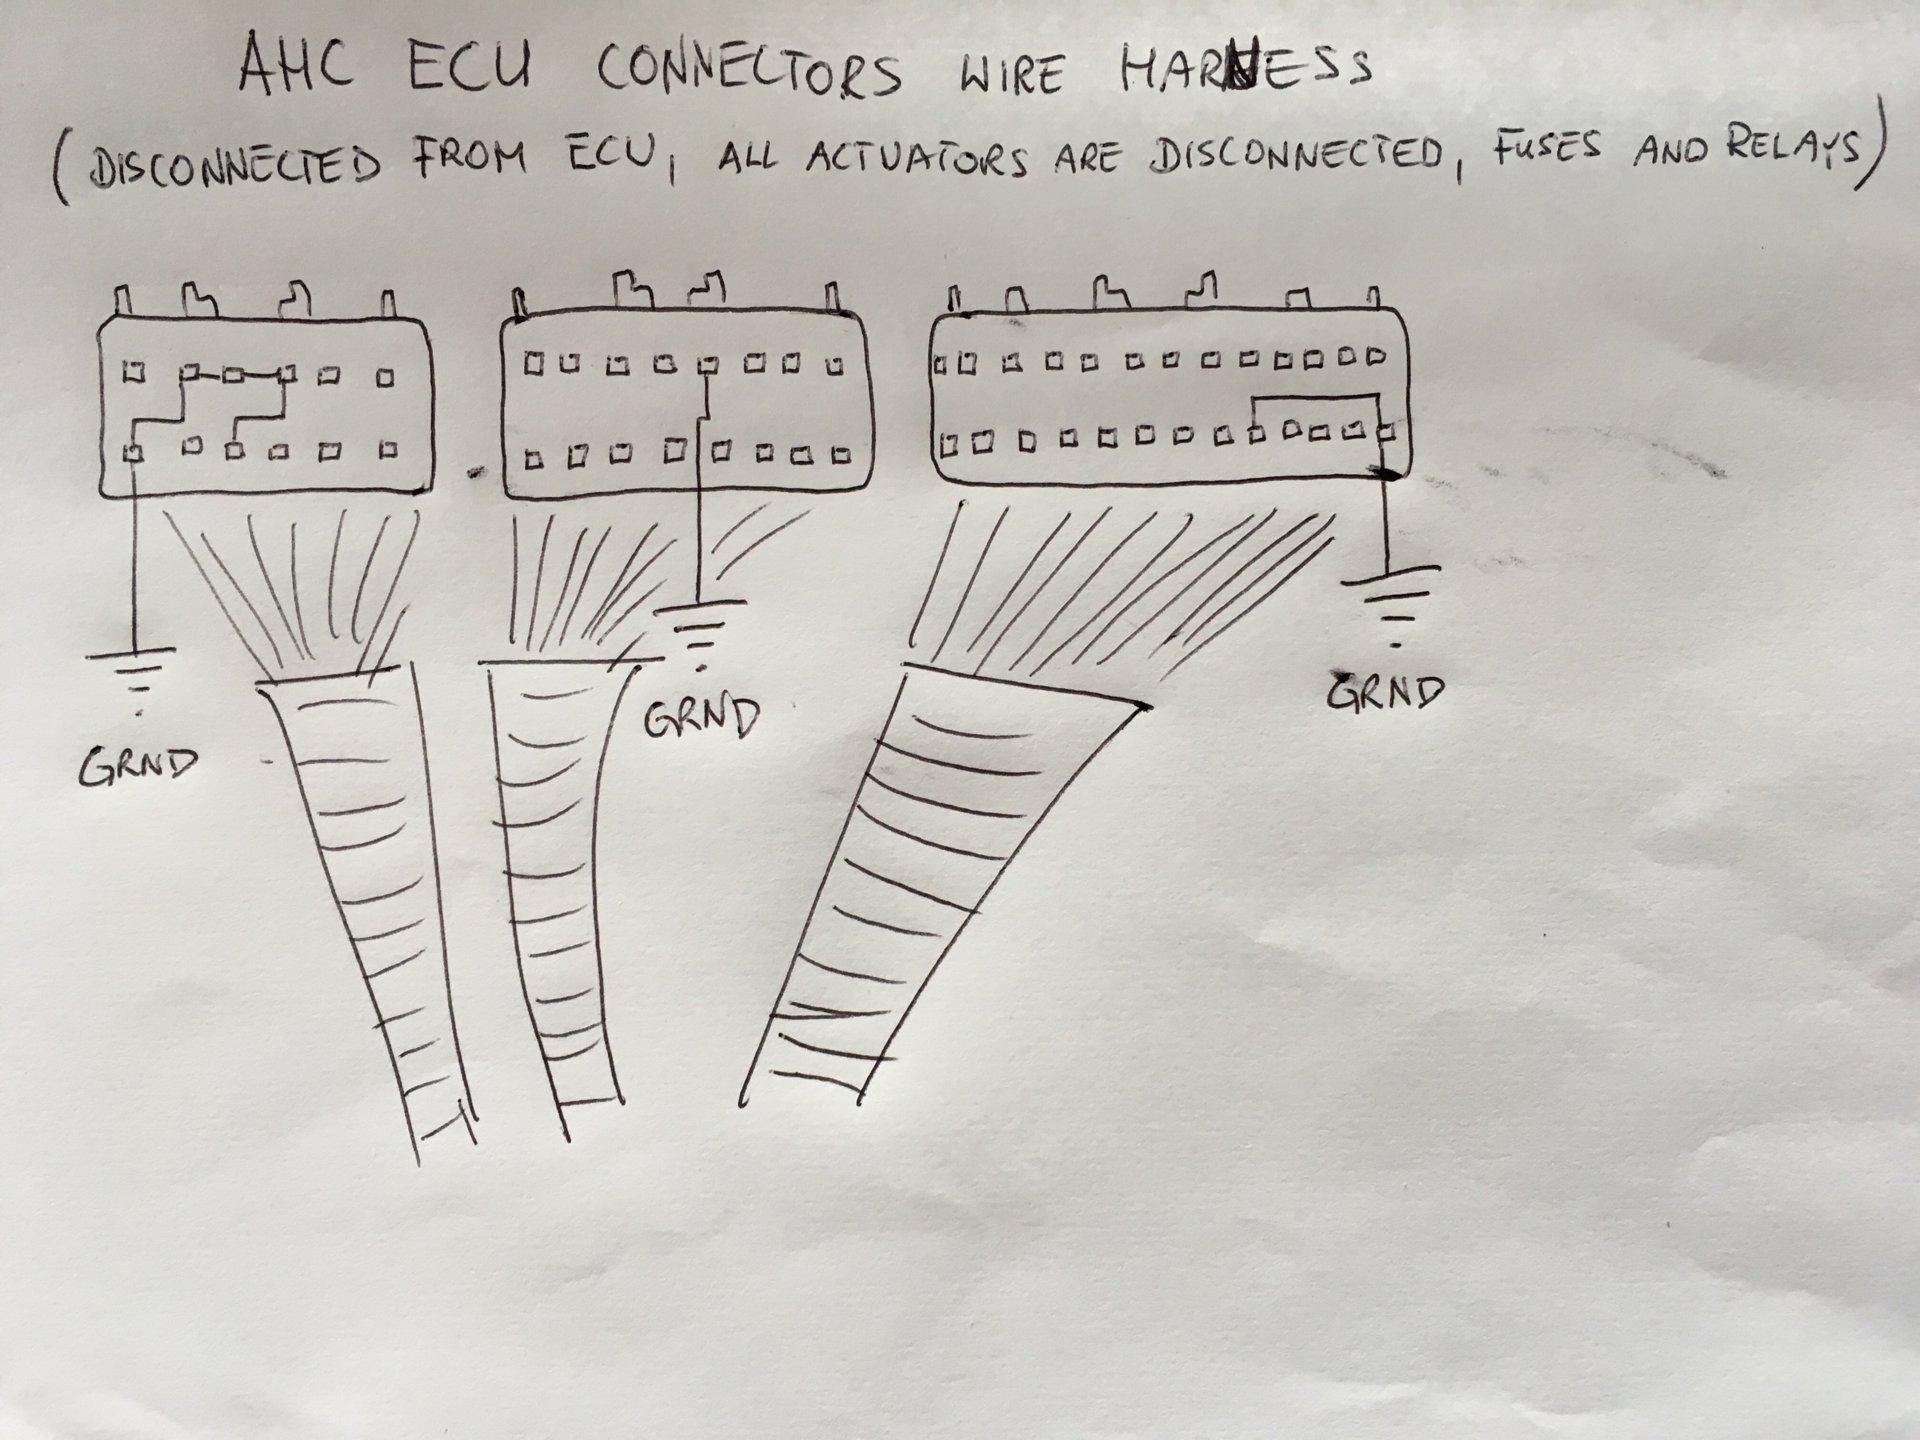 My06lx Ewd Needed Badly Ih8mud Forum Amc Wiring Harness Diagram Img 8265